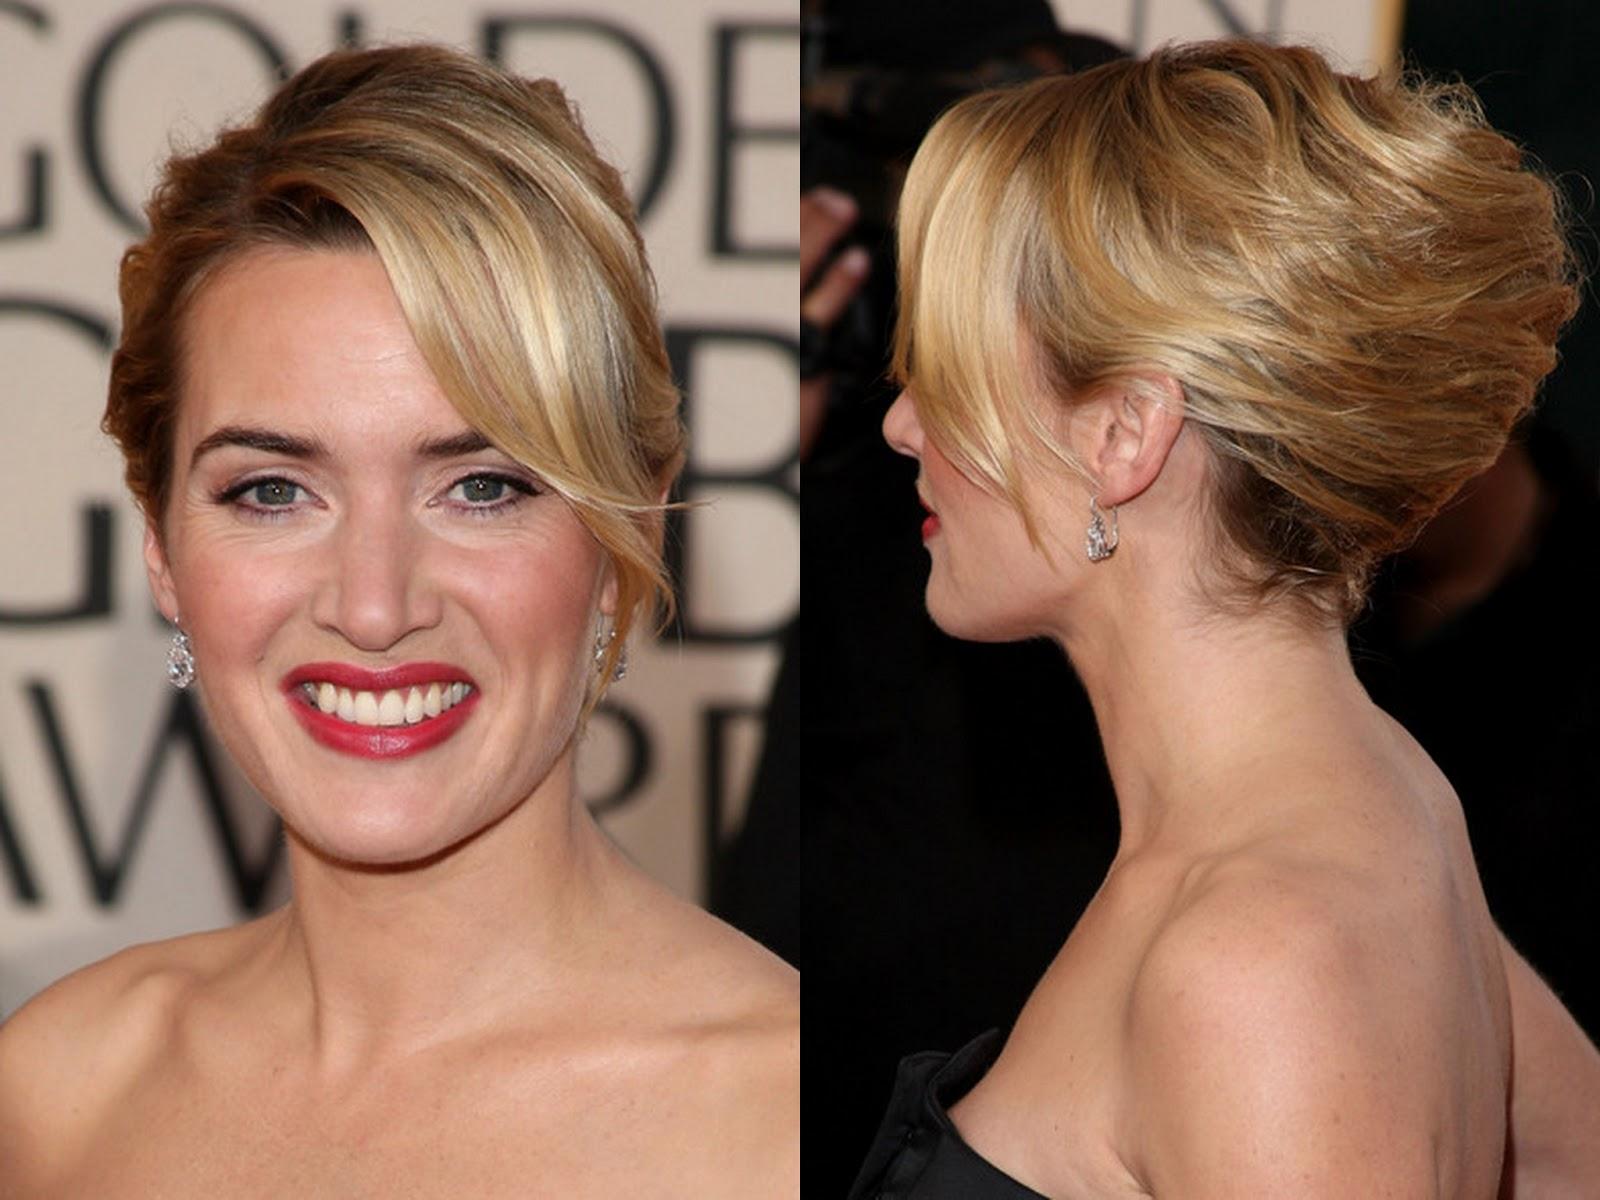 Ouvrir salon de coiffure avec diplome etranger coiffure - Ouvrir salon coiffure ...